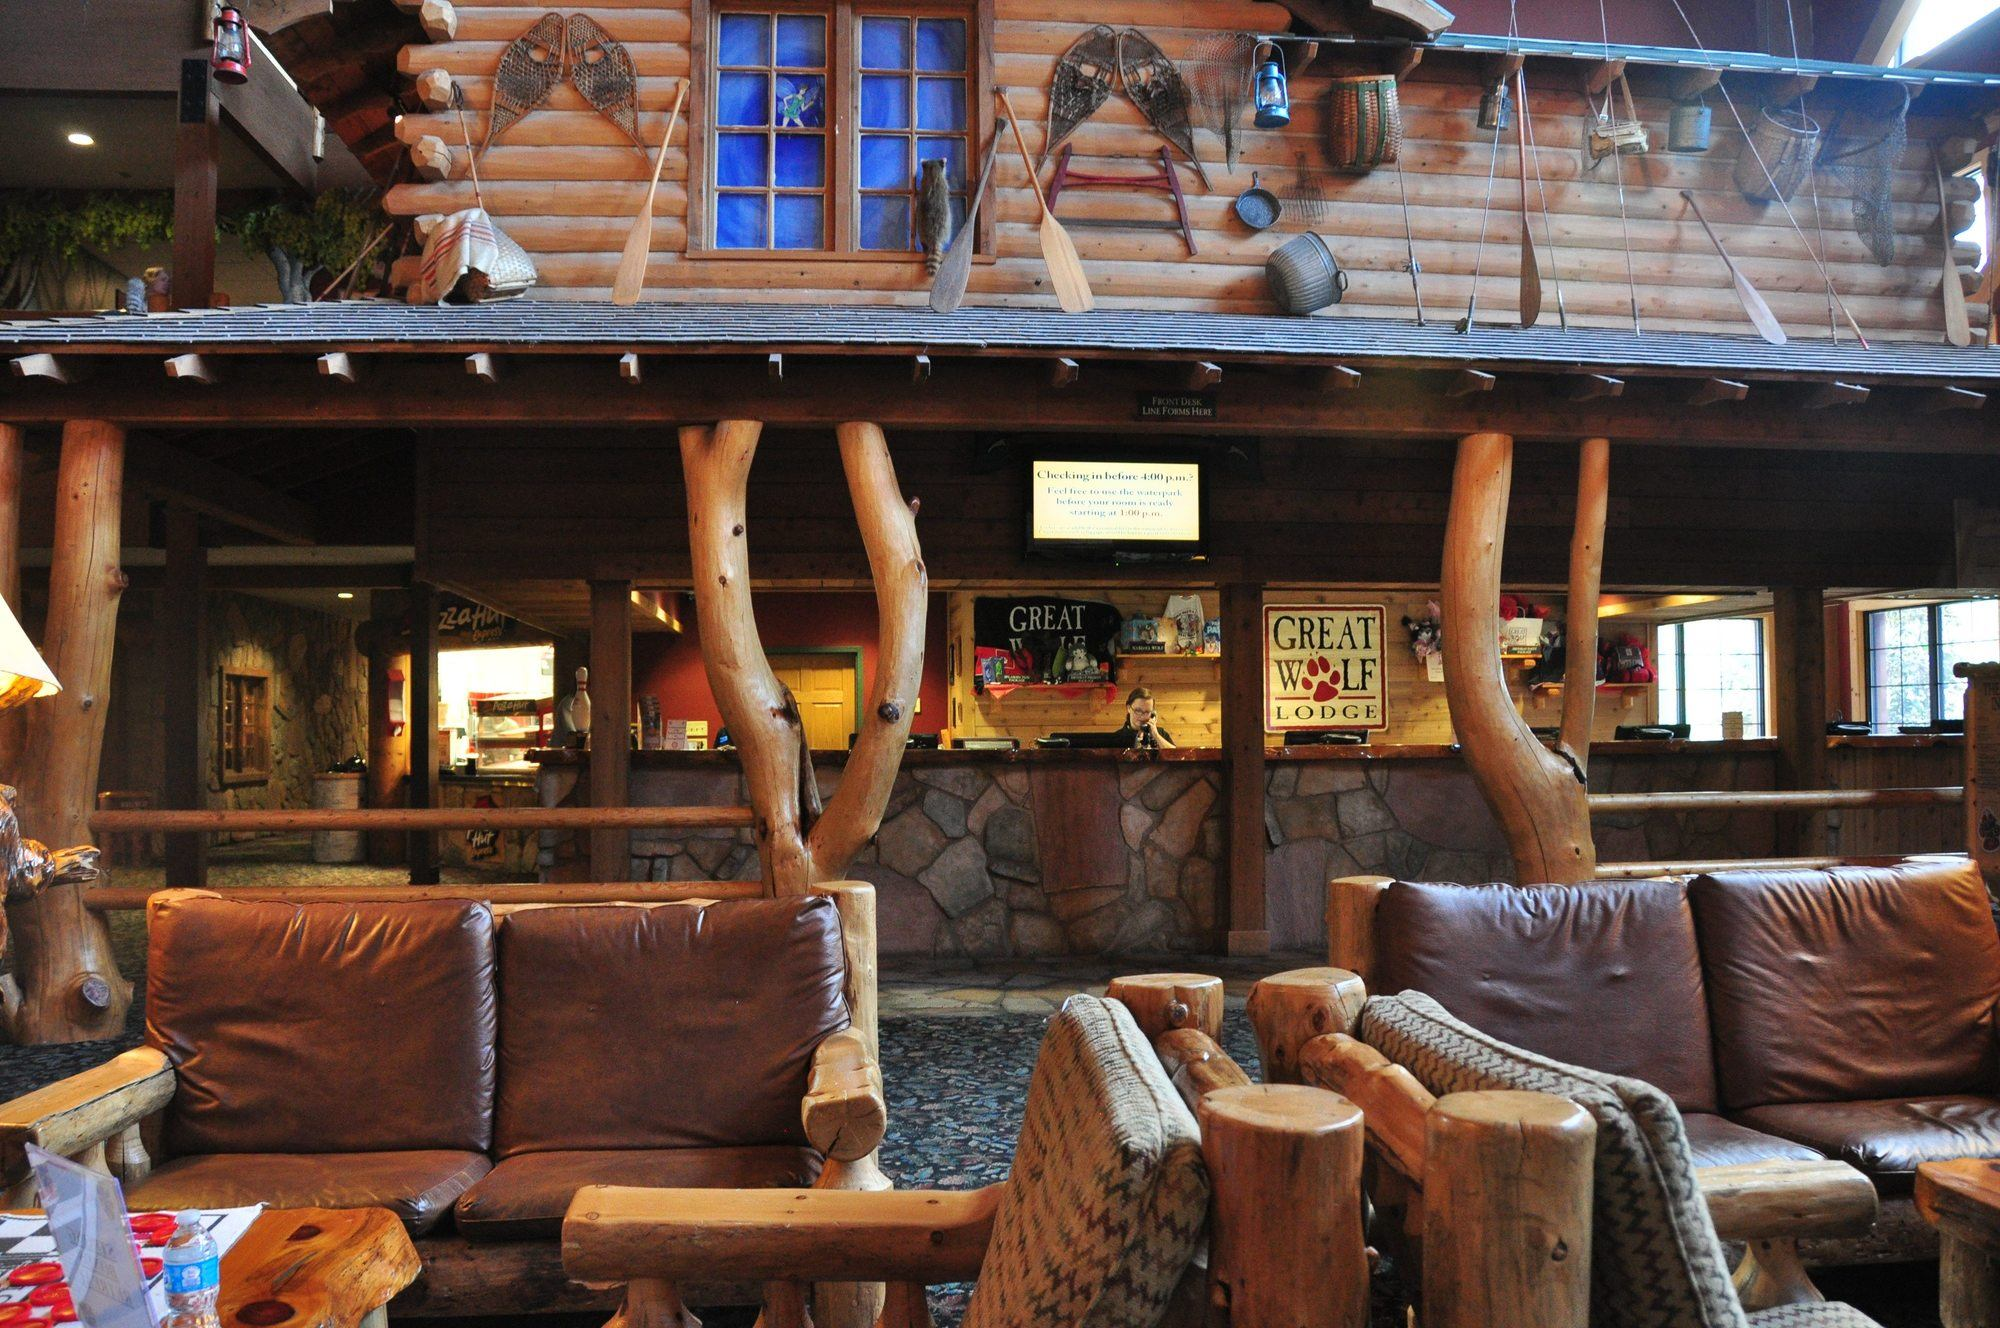 Great Wolf Lodge Williamsburg Lobby